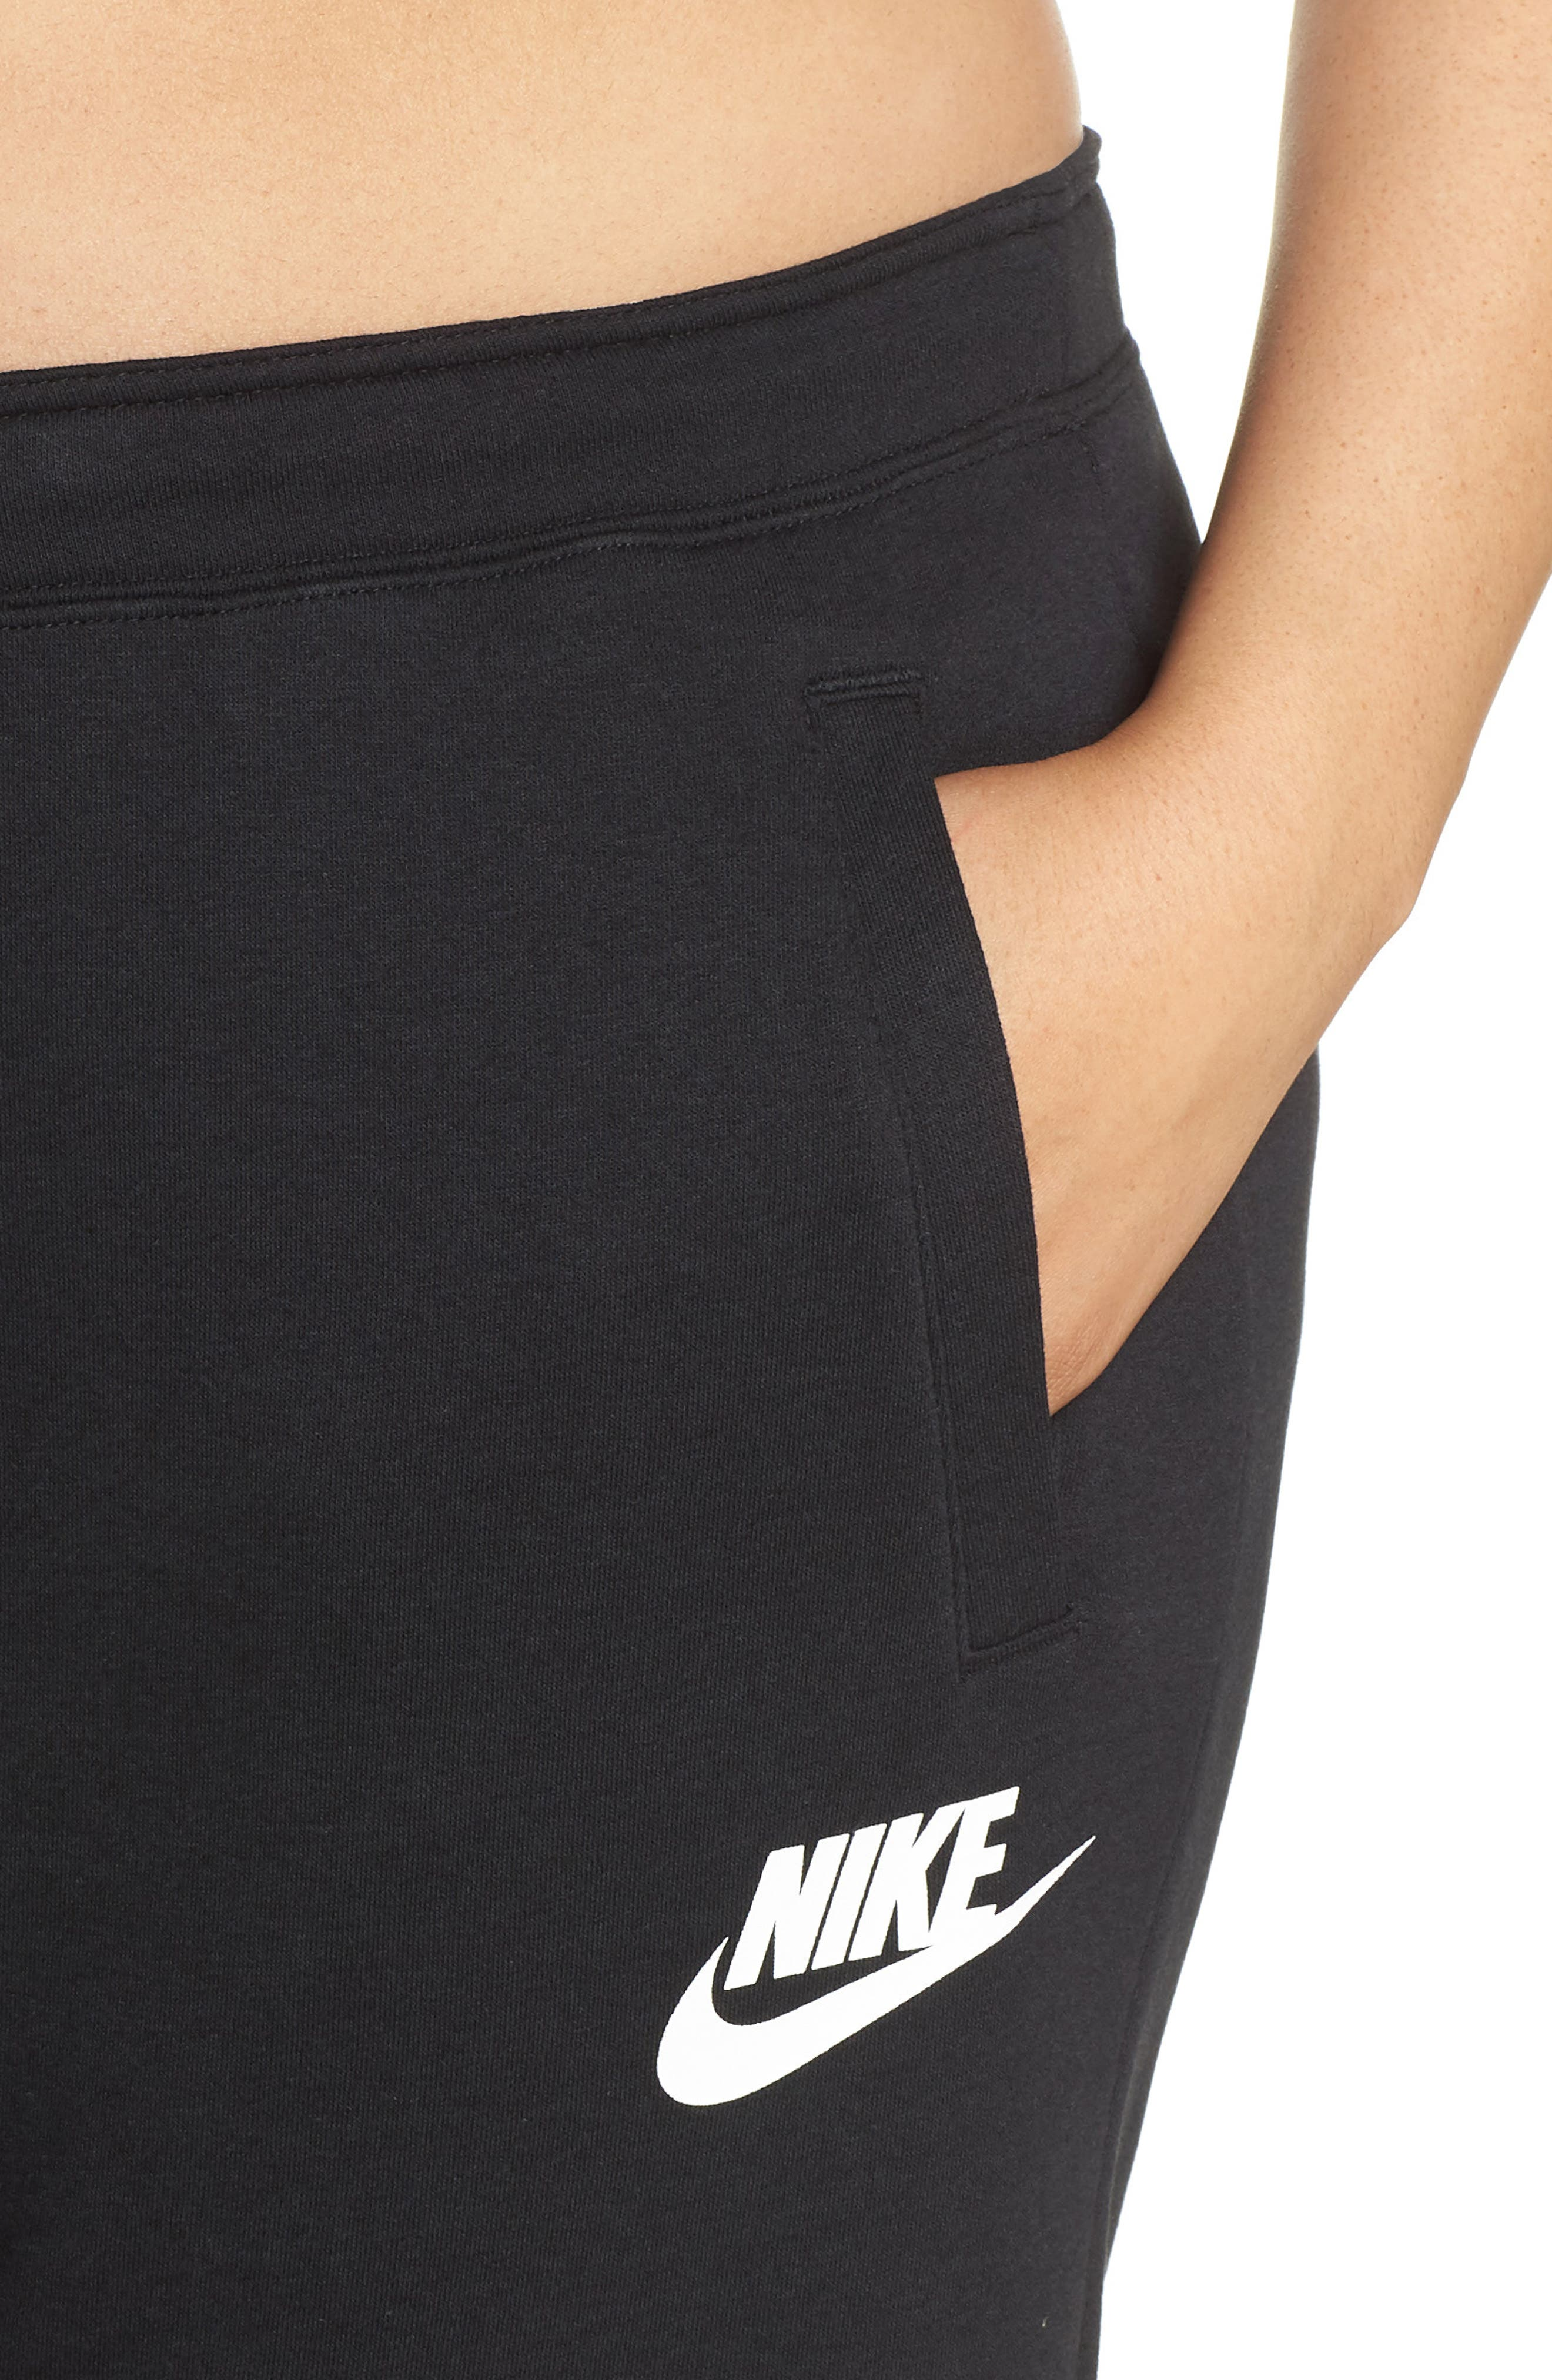 NIKE, Sportswear Rally High Rise Jogger Pants, Alternate thumbnail 5, color, BLACK/ BLACK/ WHITE